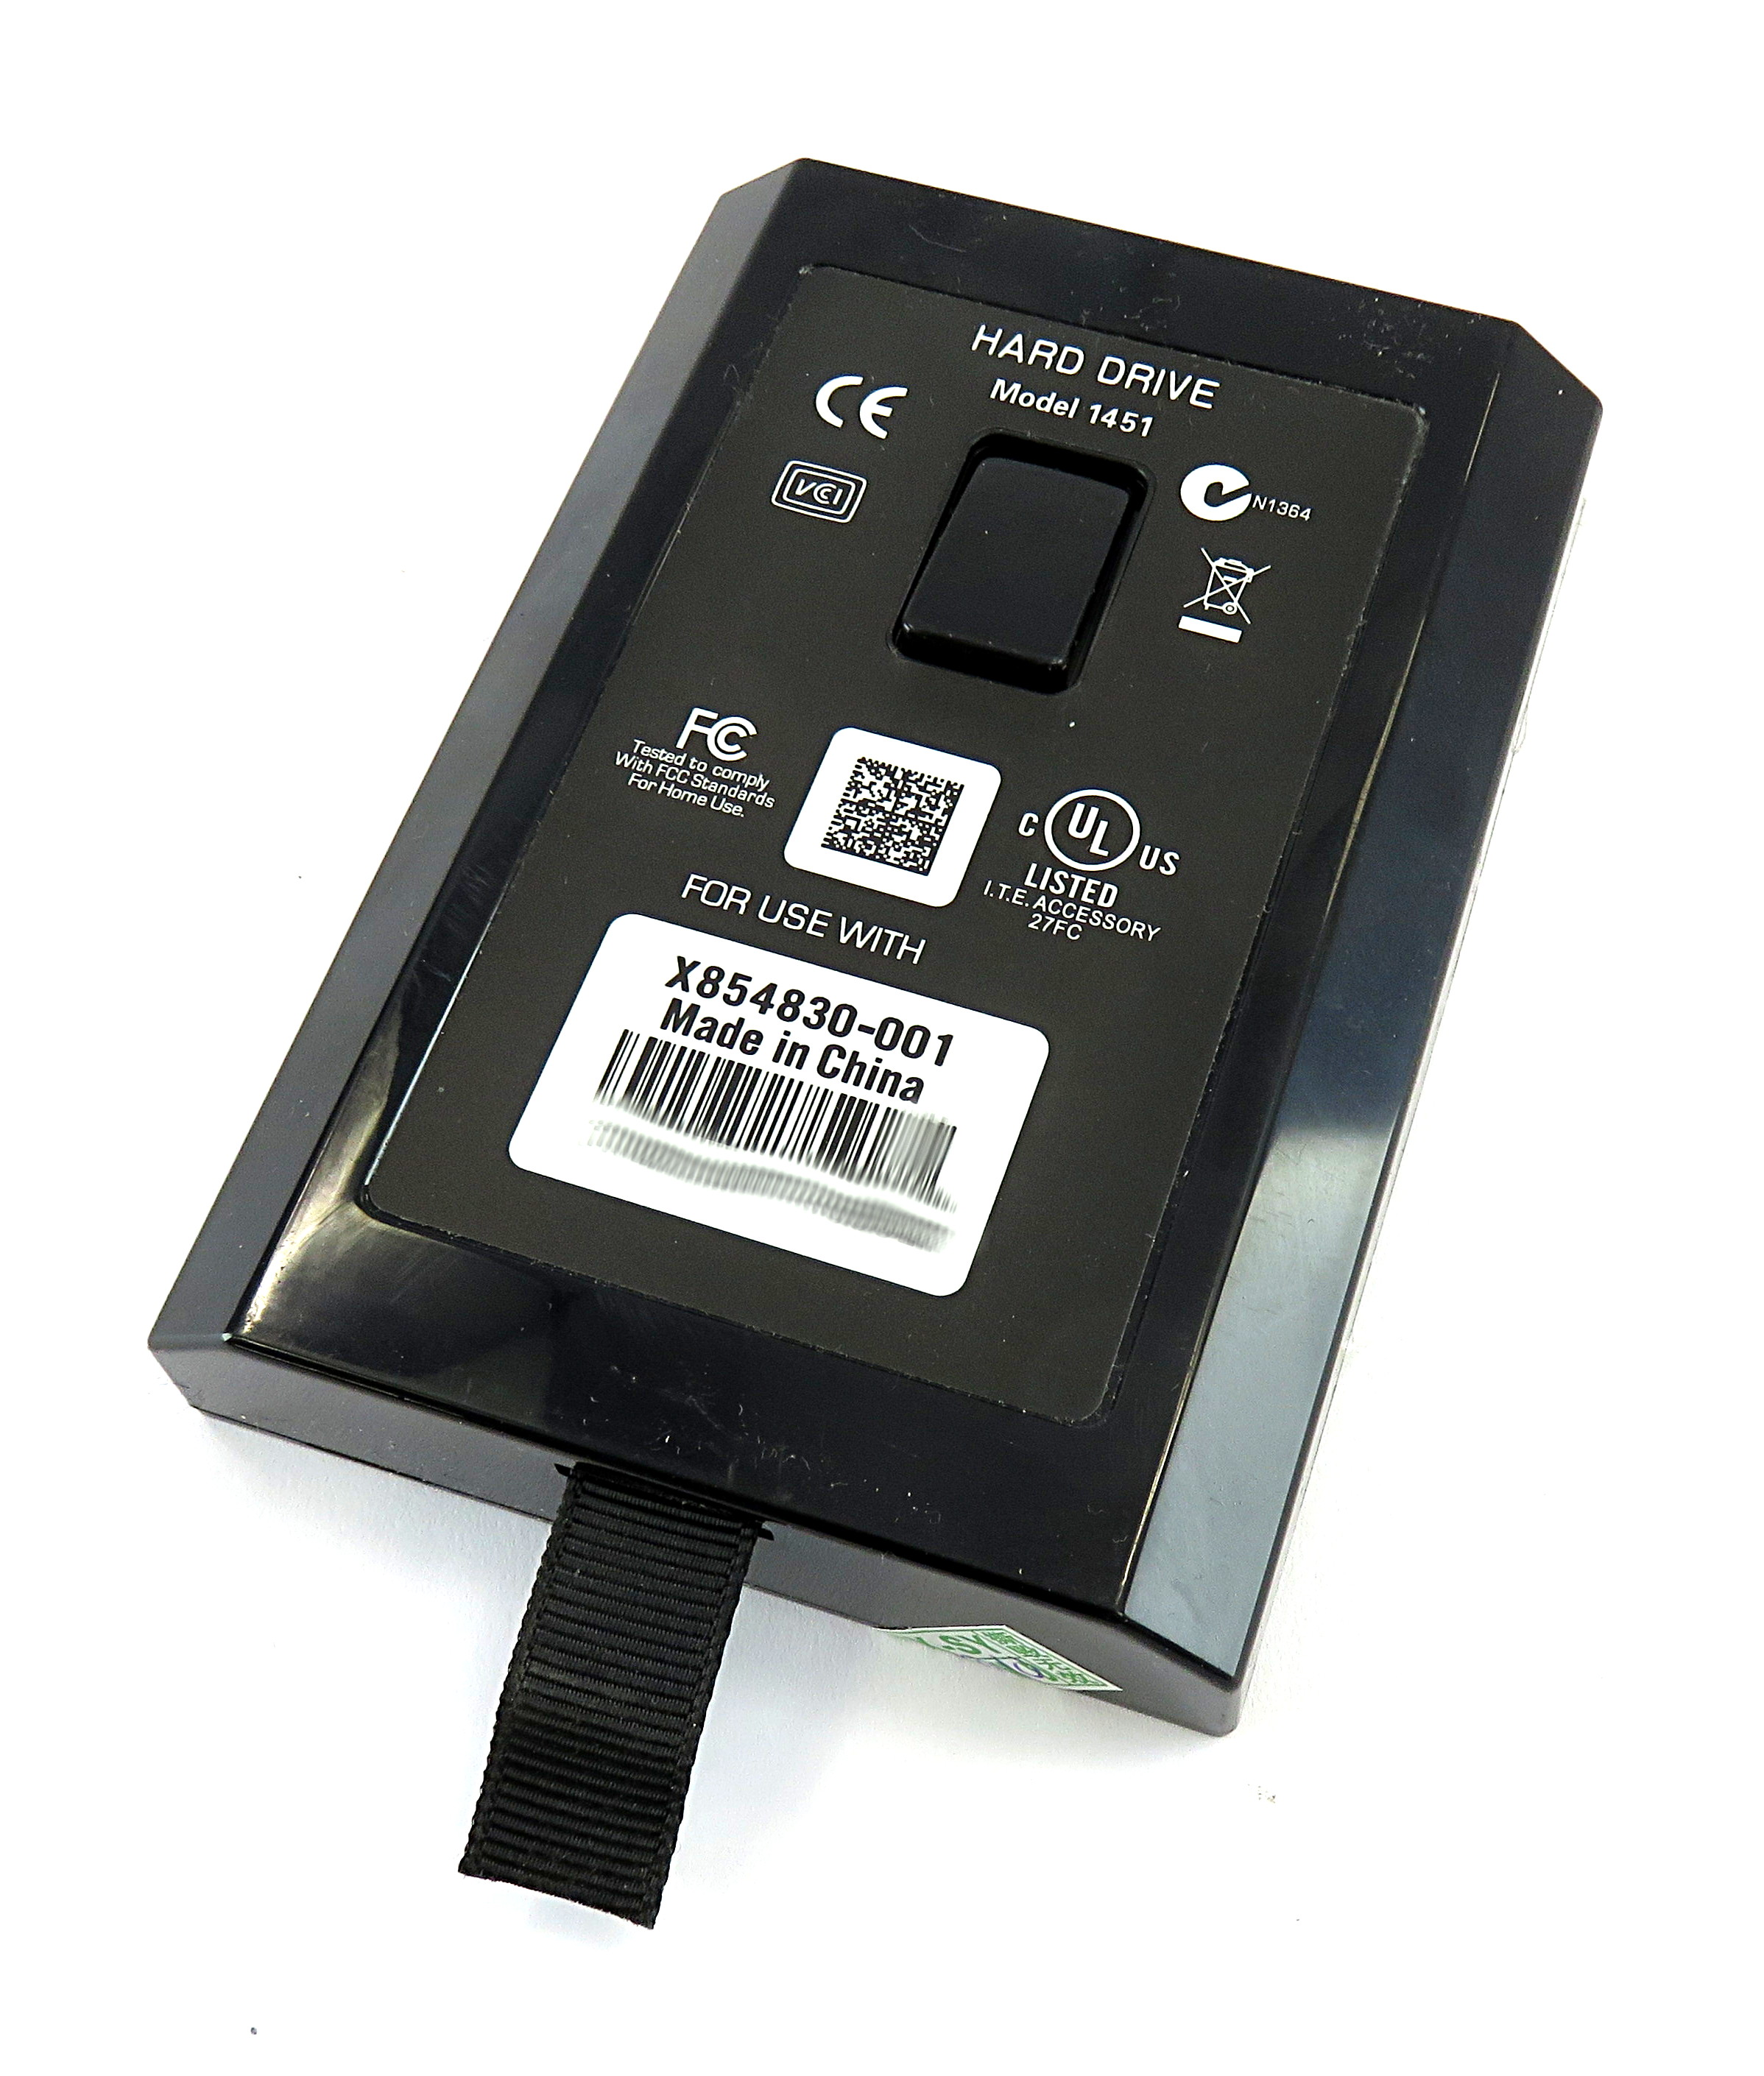 Microsoft X854830-001 250GB Slim Hard Drive Type 1451 f/ XBOX 360